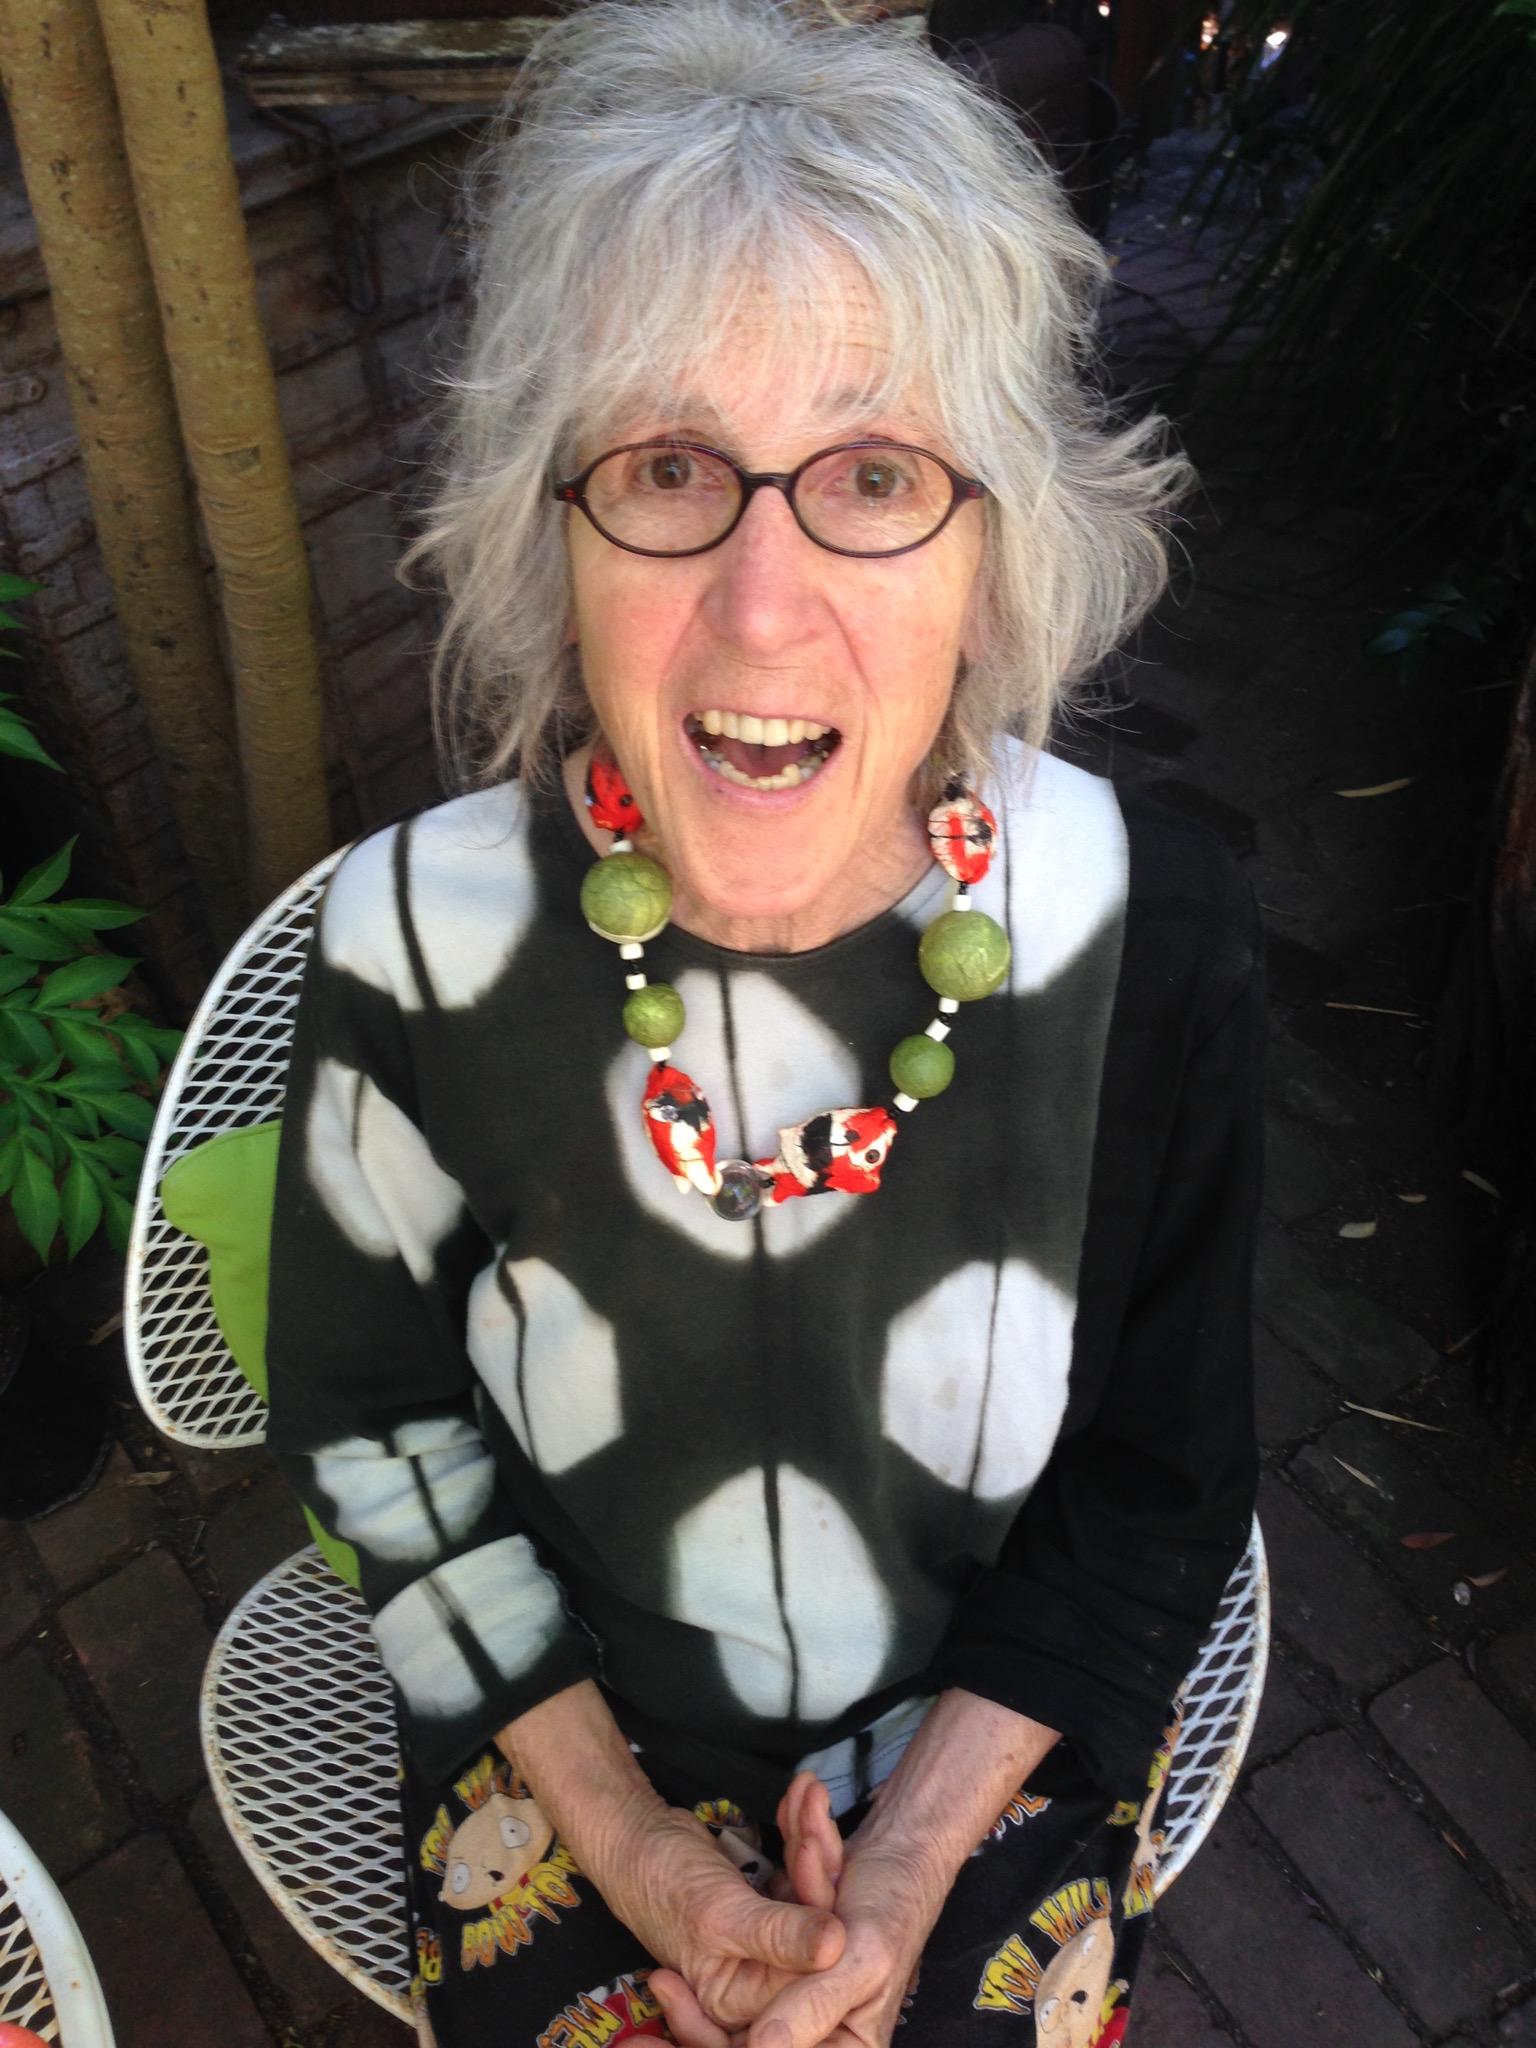 Marcia Donahue   Marcia is a world-class gardener and ceramic sculpture artist based in Berkeley, CA.   Marcia in her garden